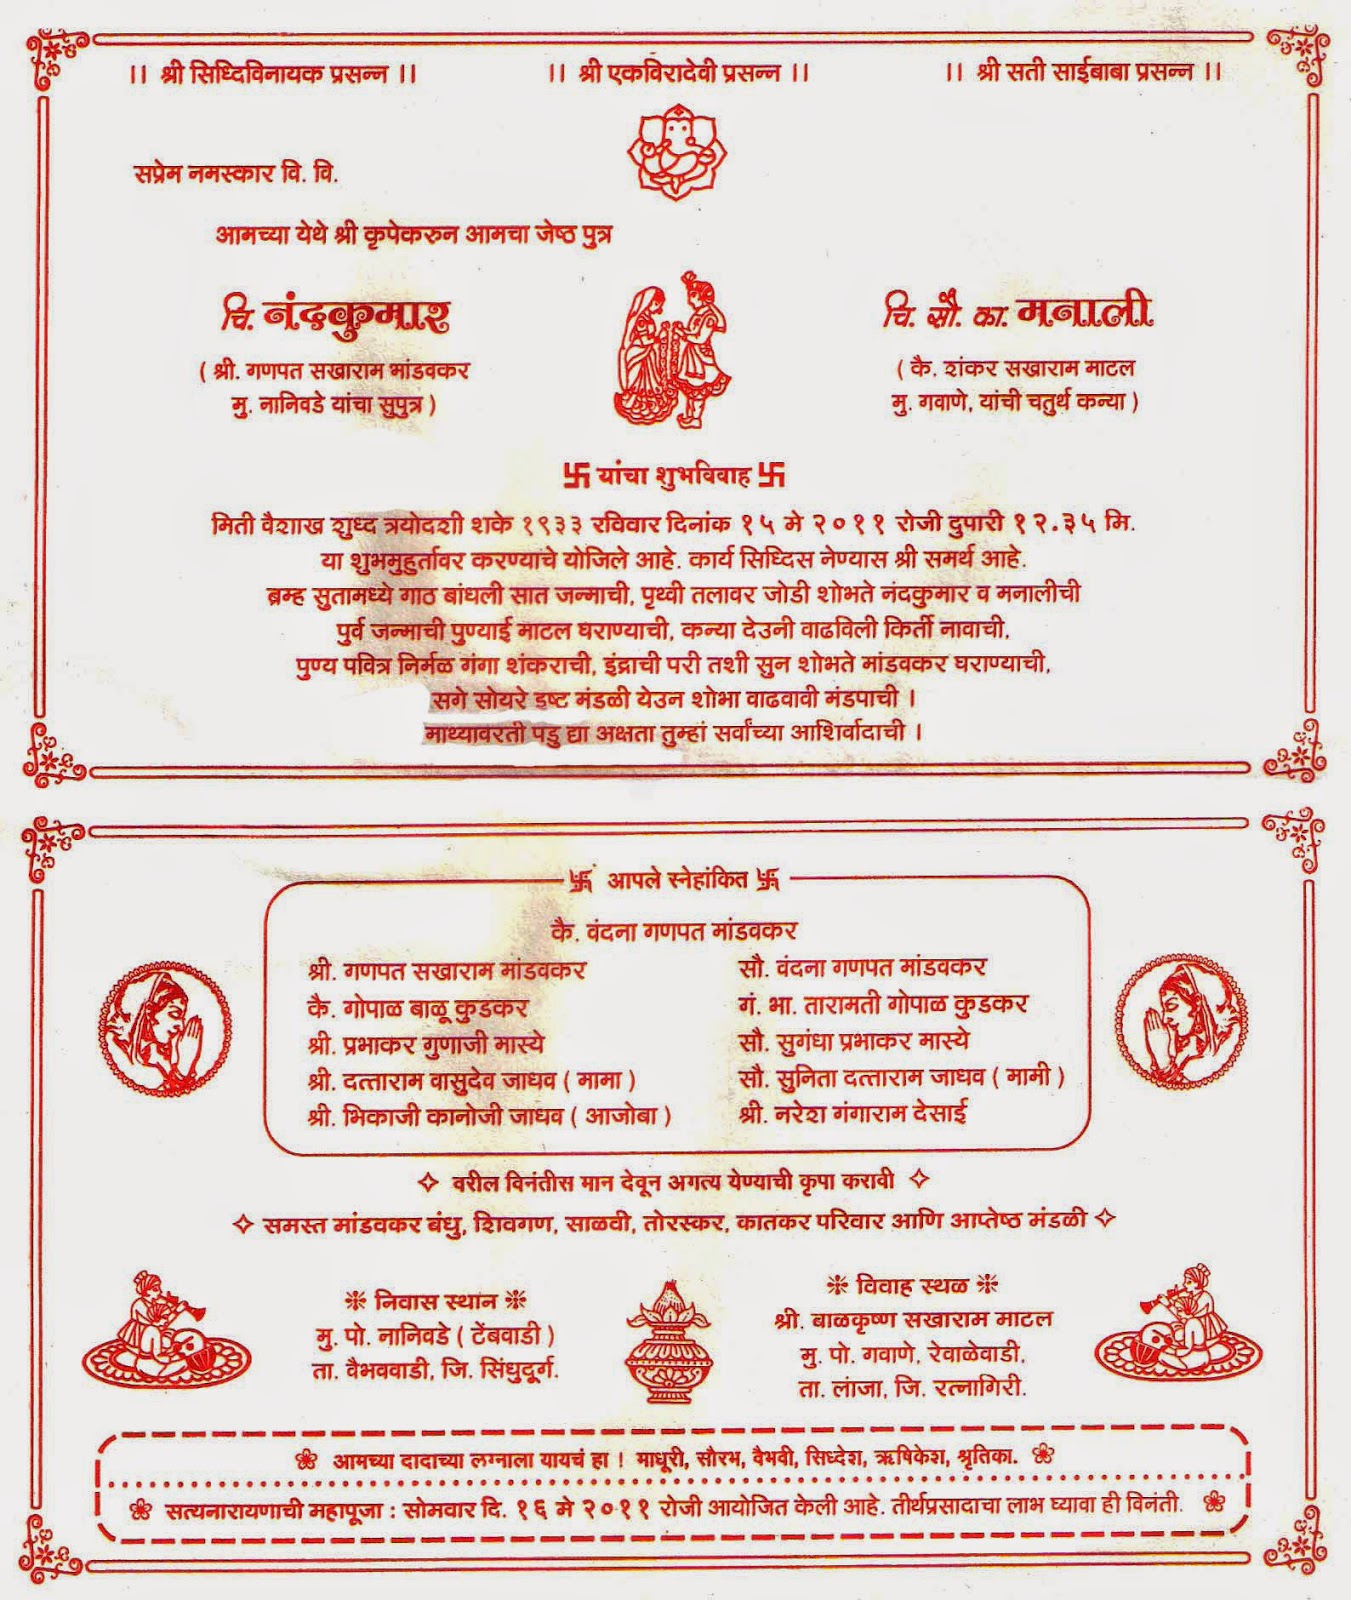 Wedding invitation card matter in marathi yaseen for 34 marathi lagna patrika marathi mayna marathi lagna patrika marathi wedding invitation card stopboris Gallery